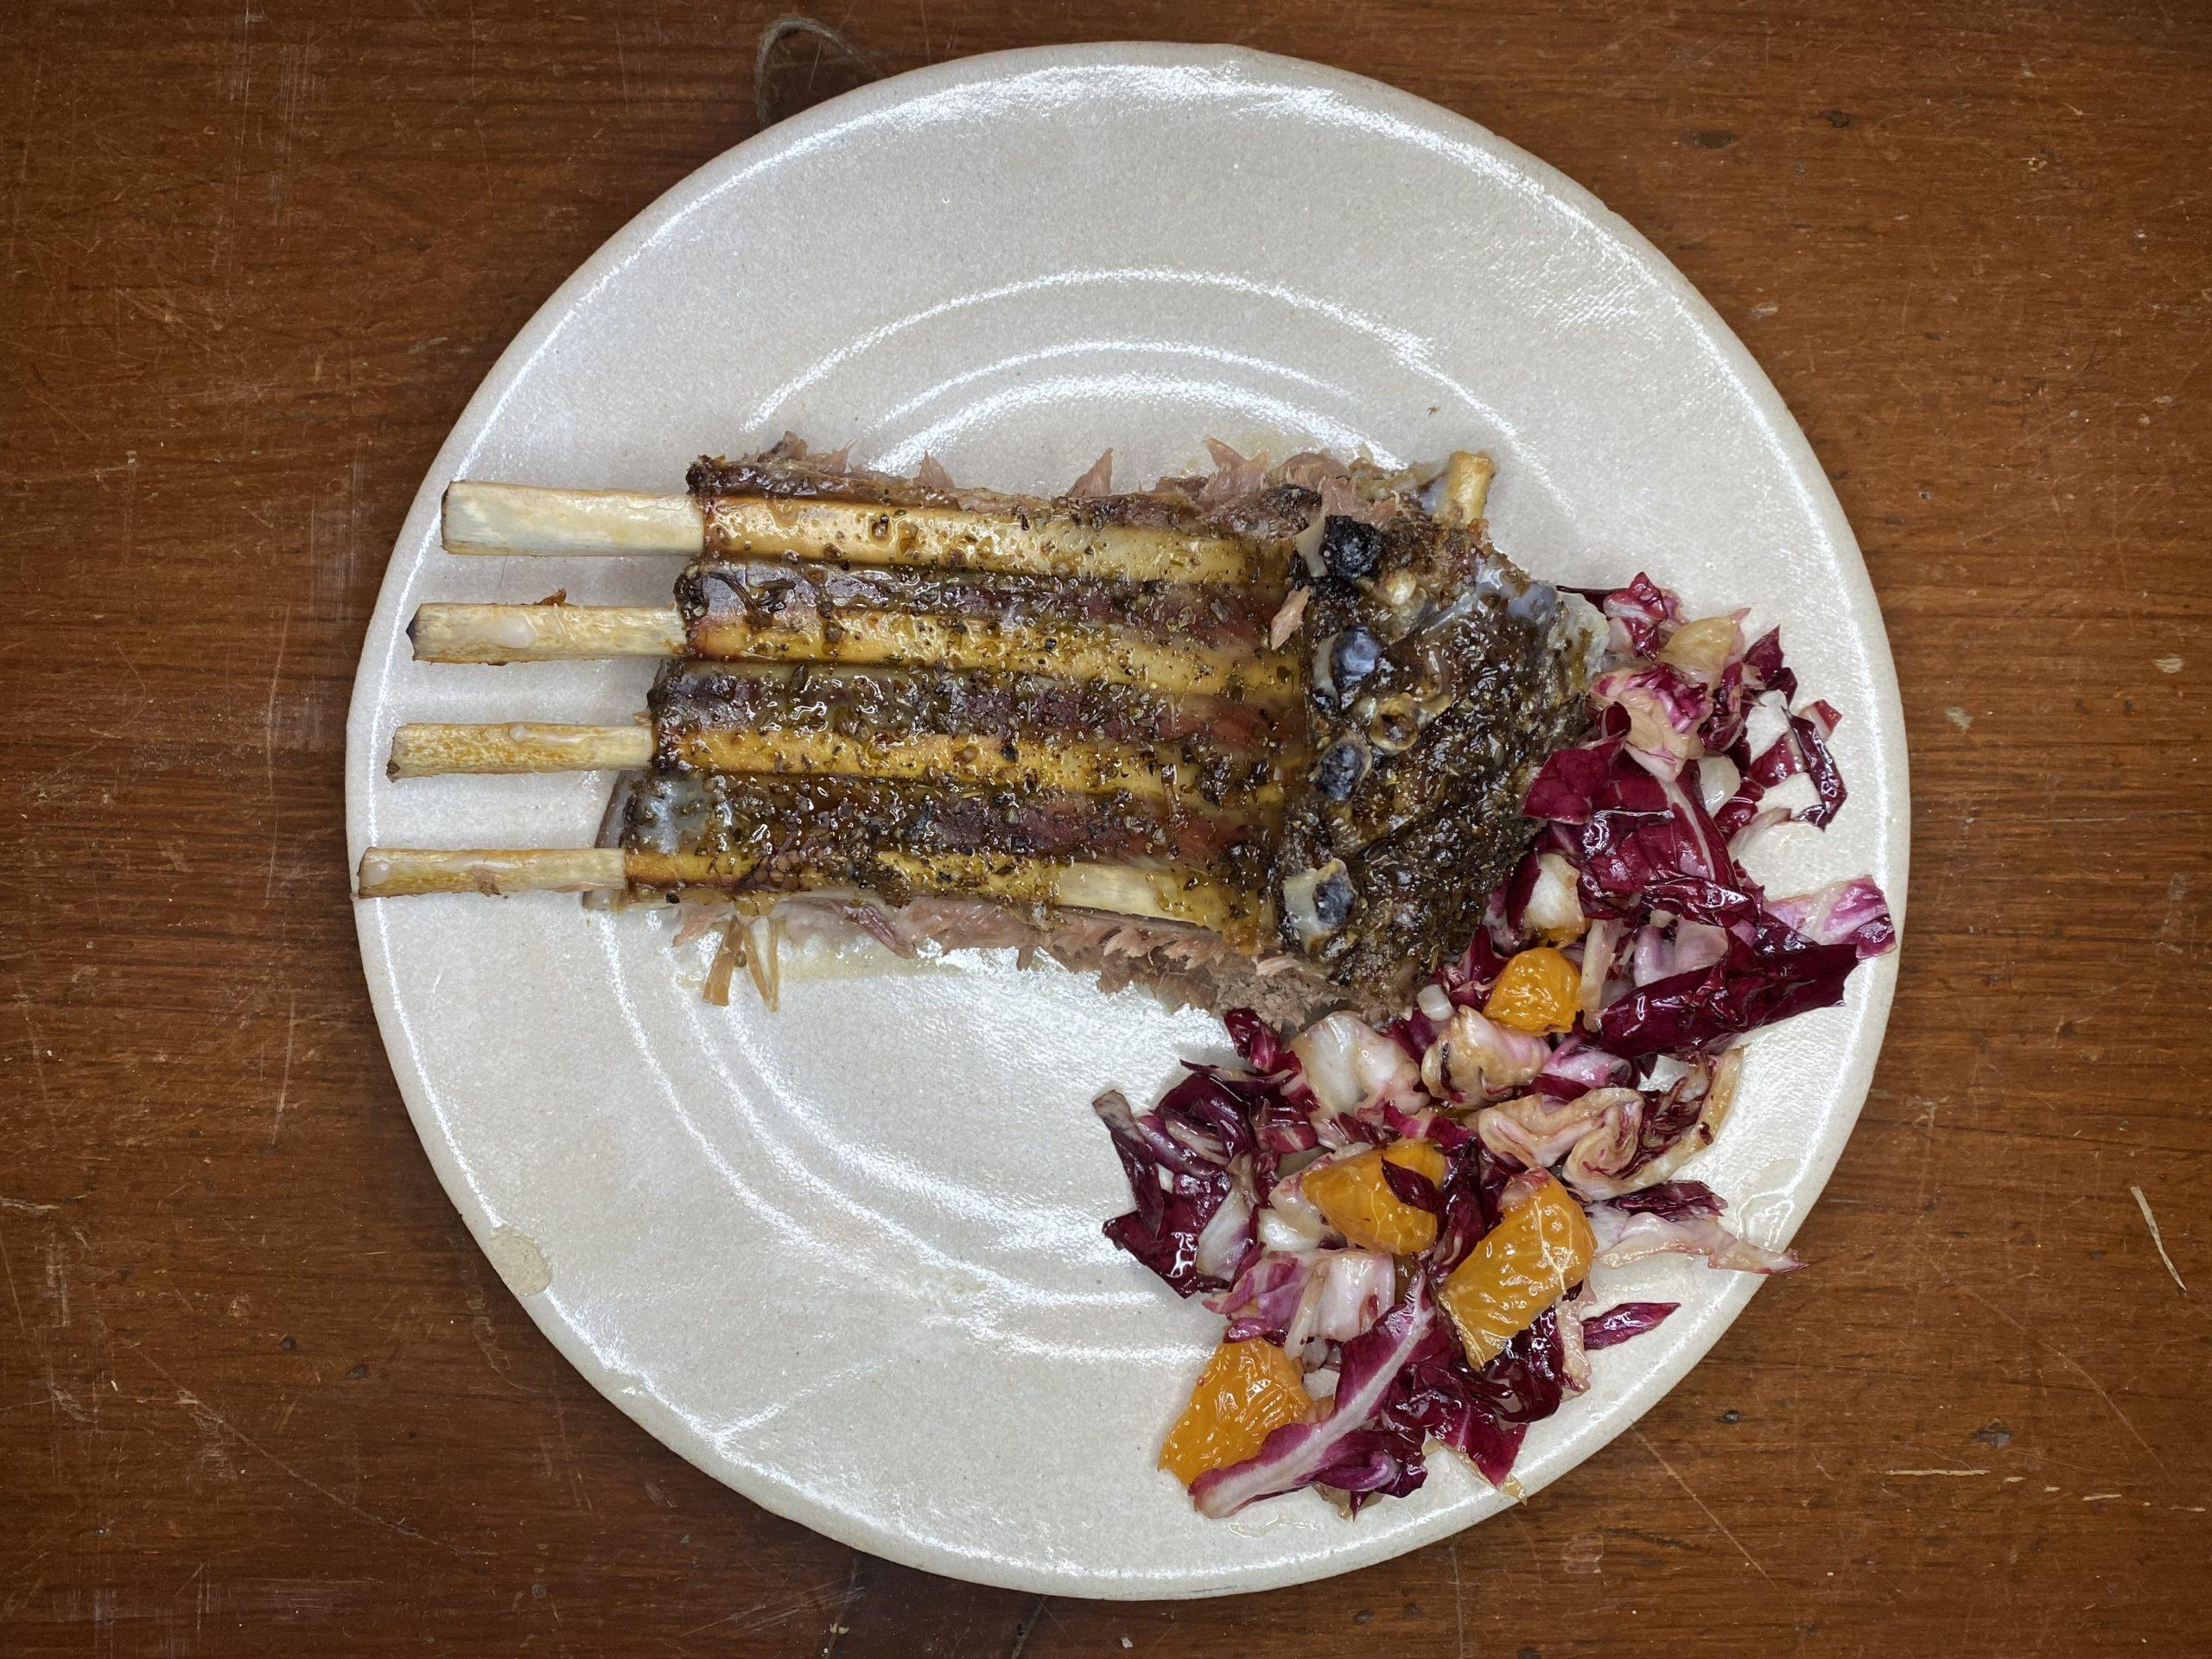 Rack of lamb on plate